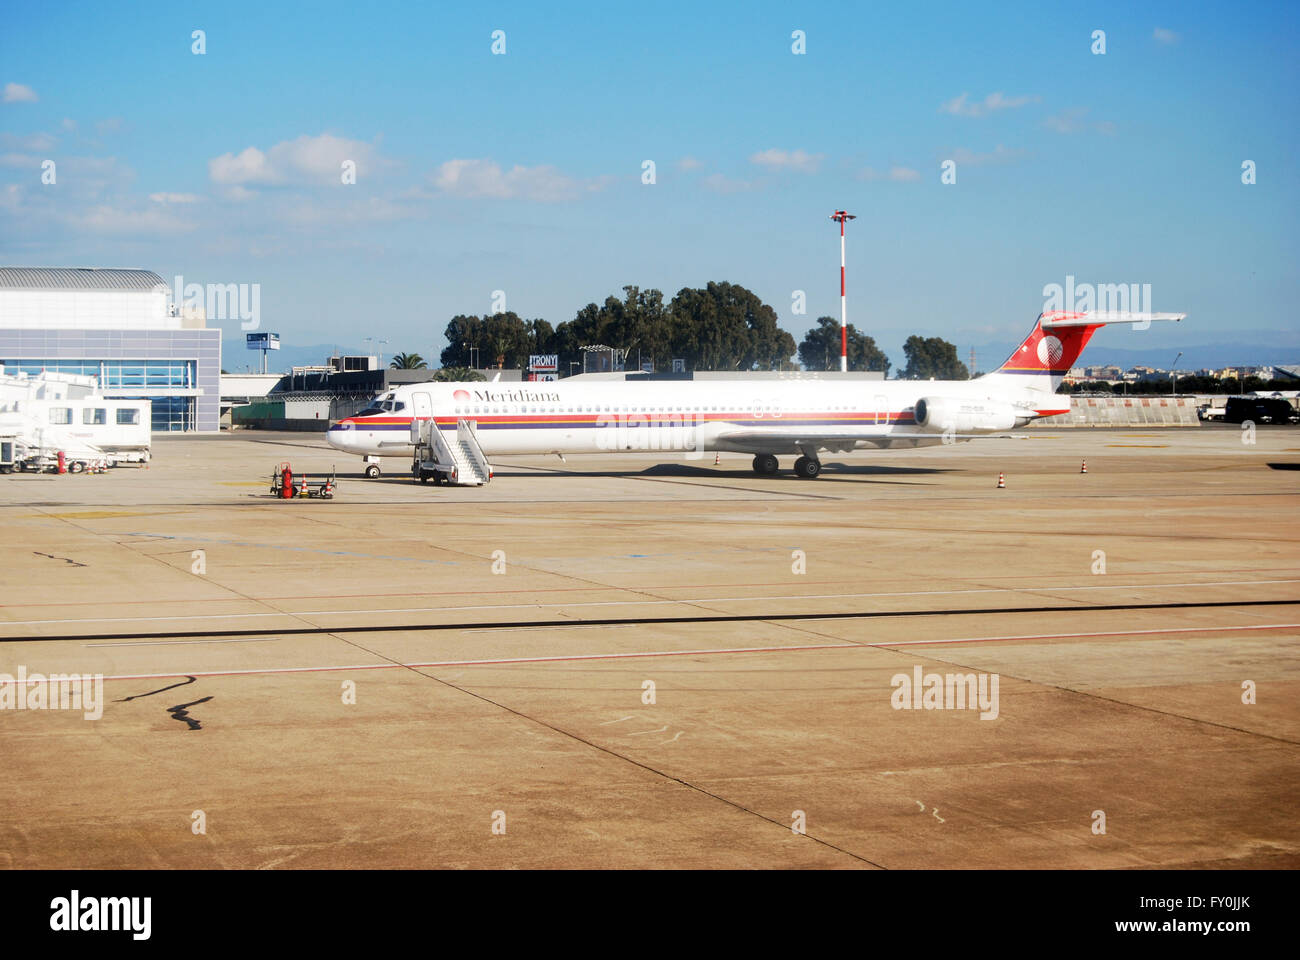 Cagliari, Italie - 24 janvier 2010: Avion Meridiana à l'aéroport de Cagliari. La terre et l'éditorial Photo Stock